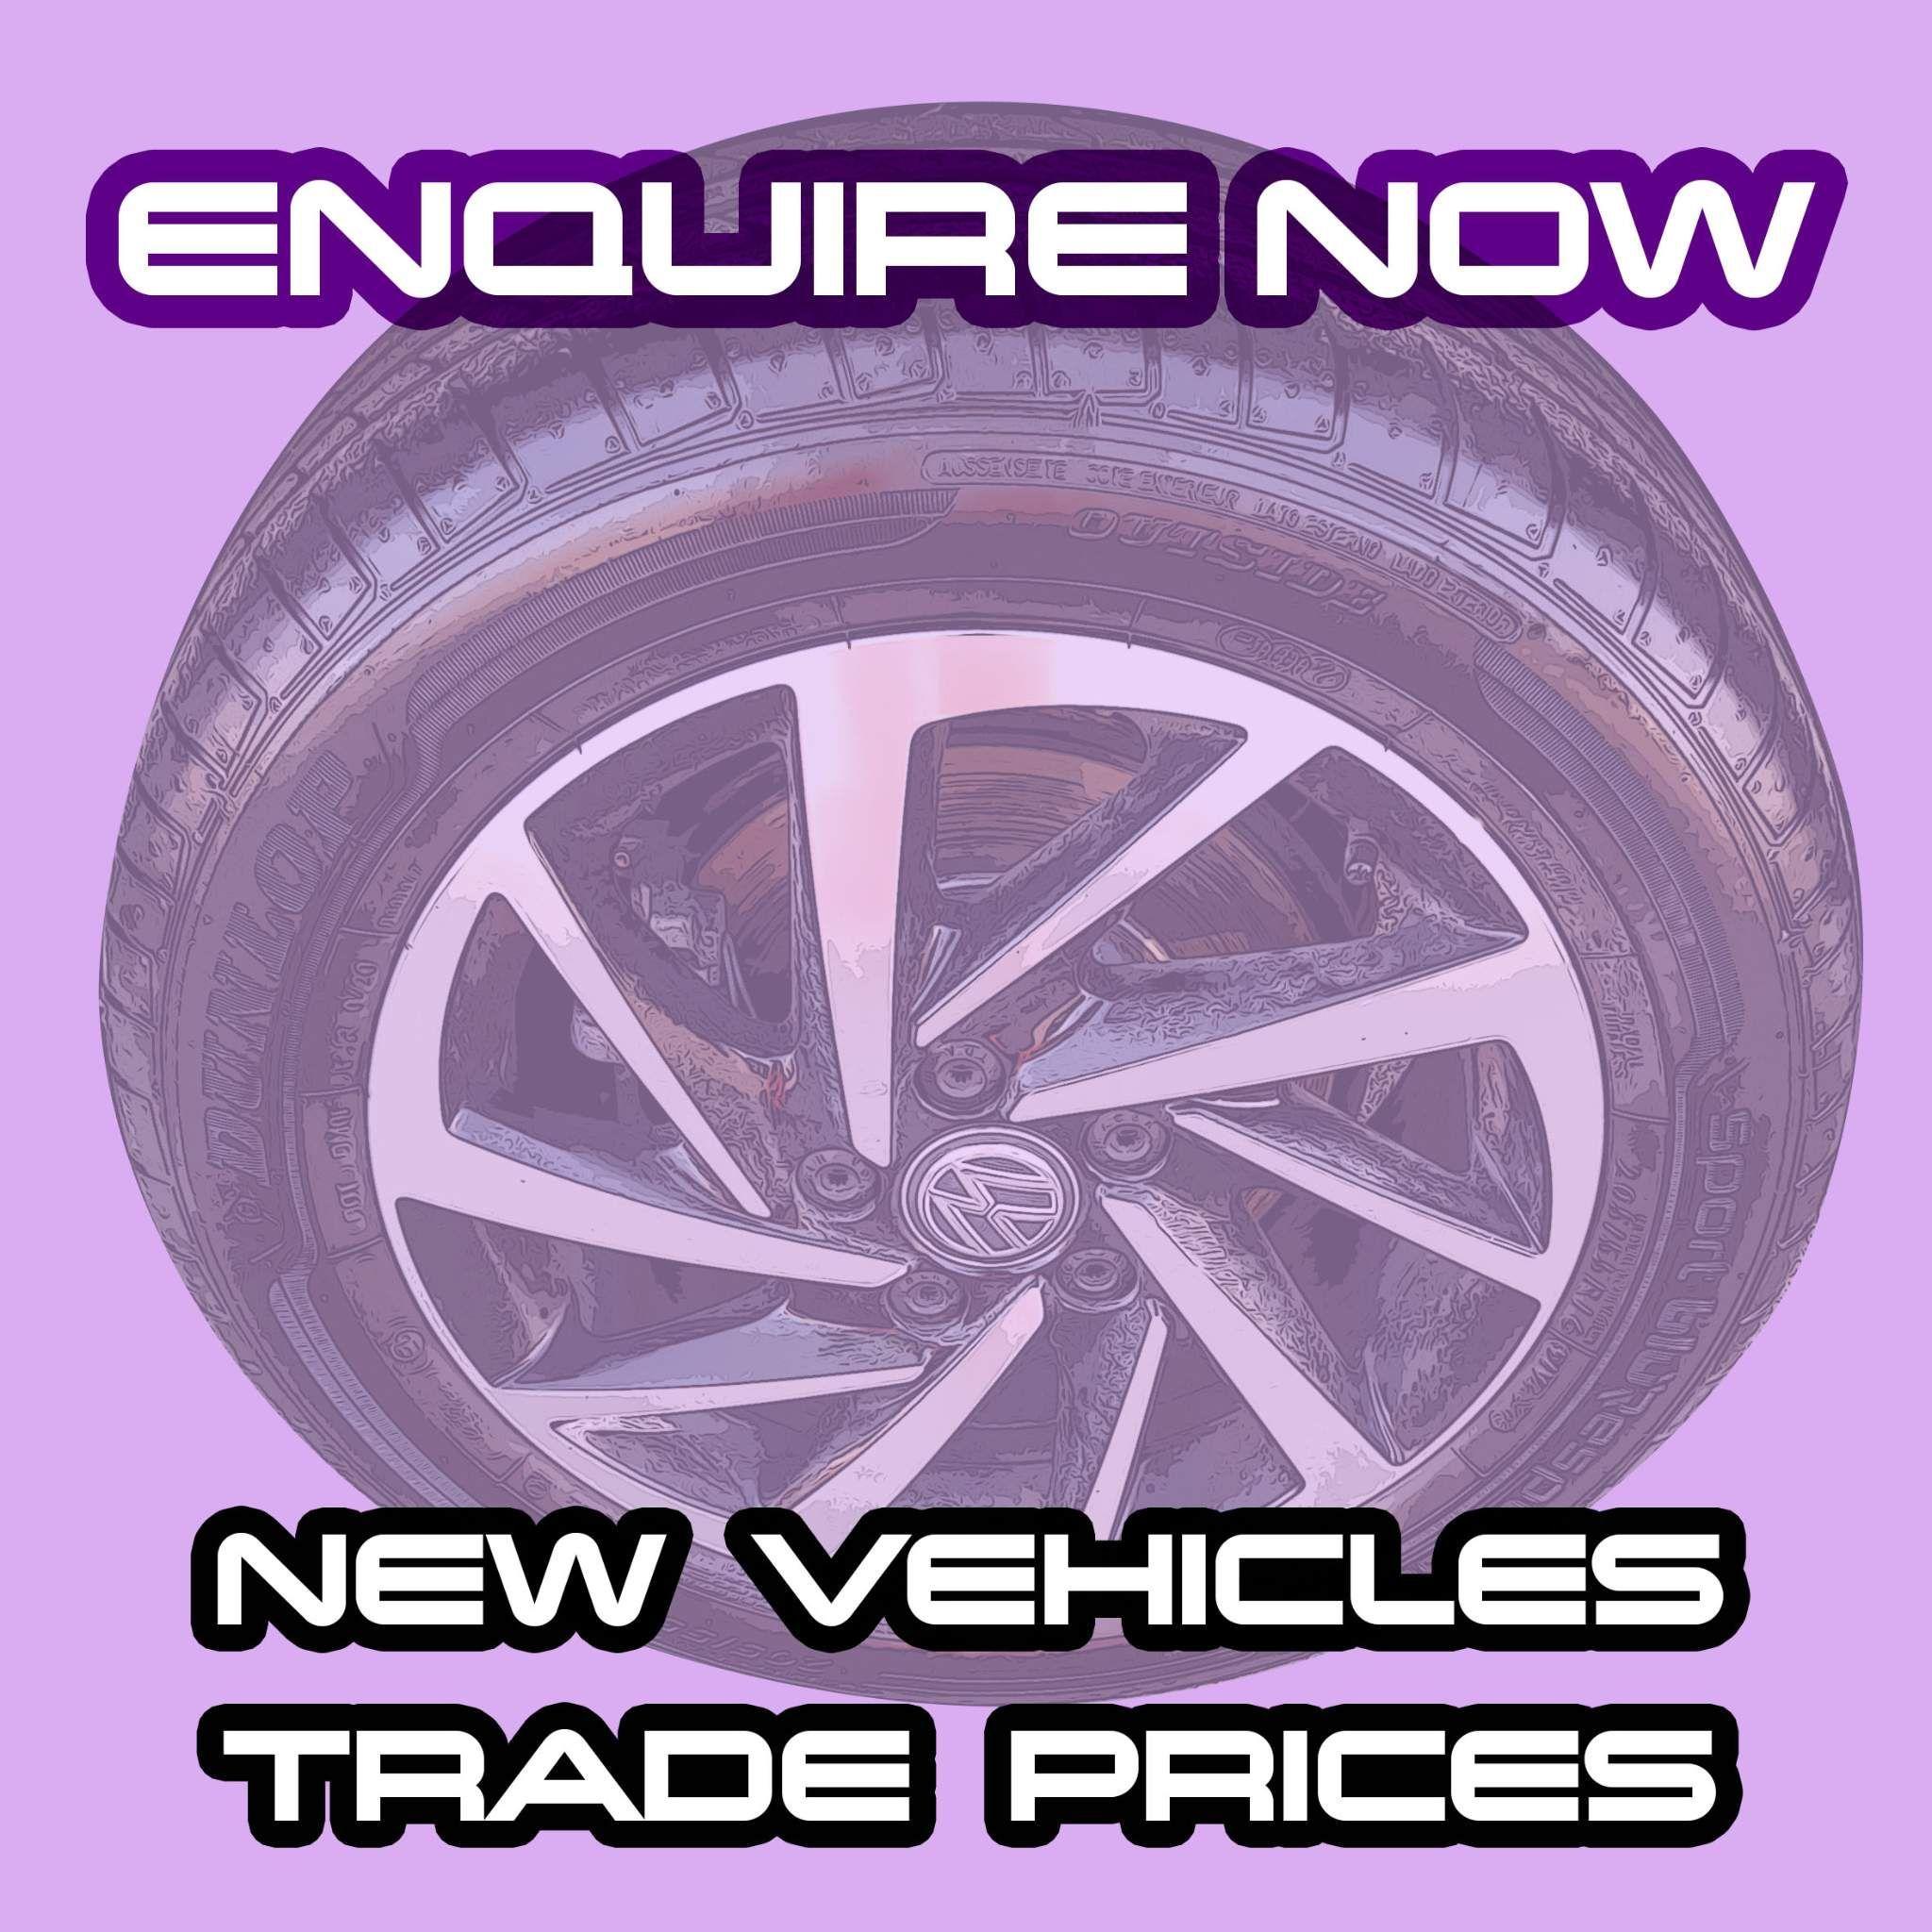 MercedesVito2.1 114 CDi SELECT Tourer G-Tronic RWD L3 EU6 5dr For Sale